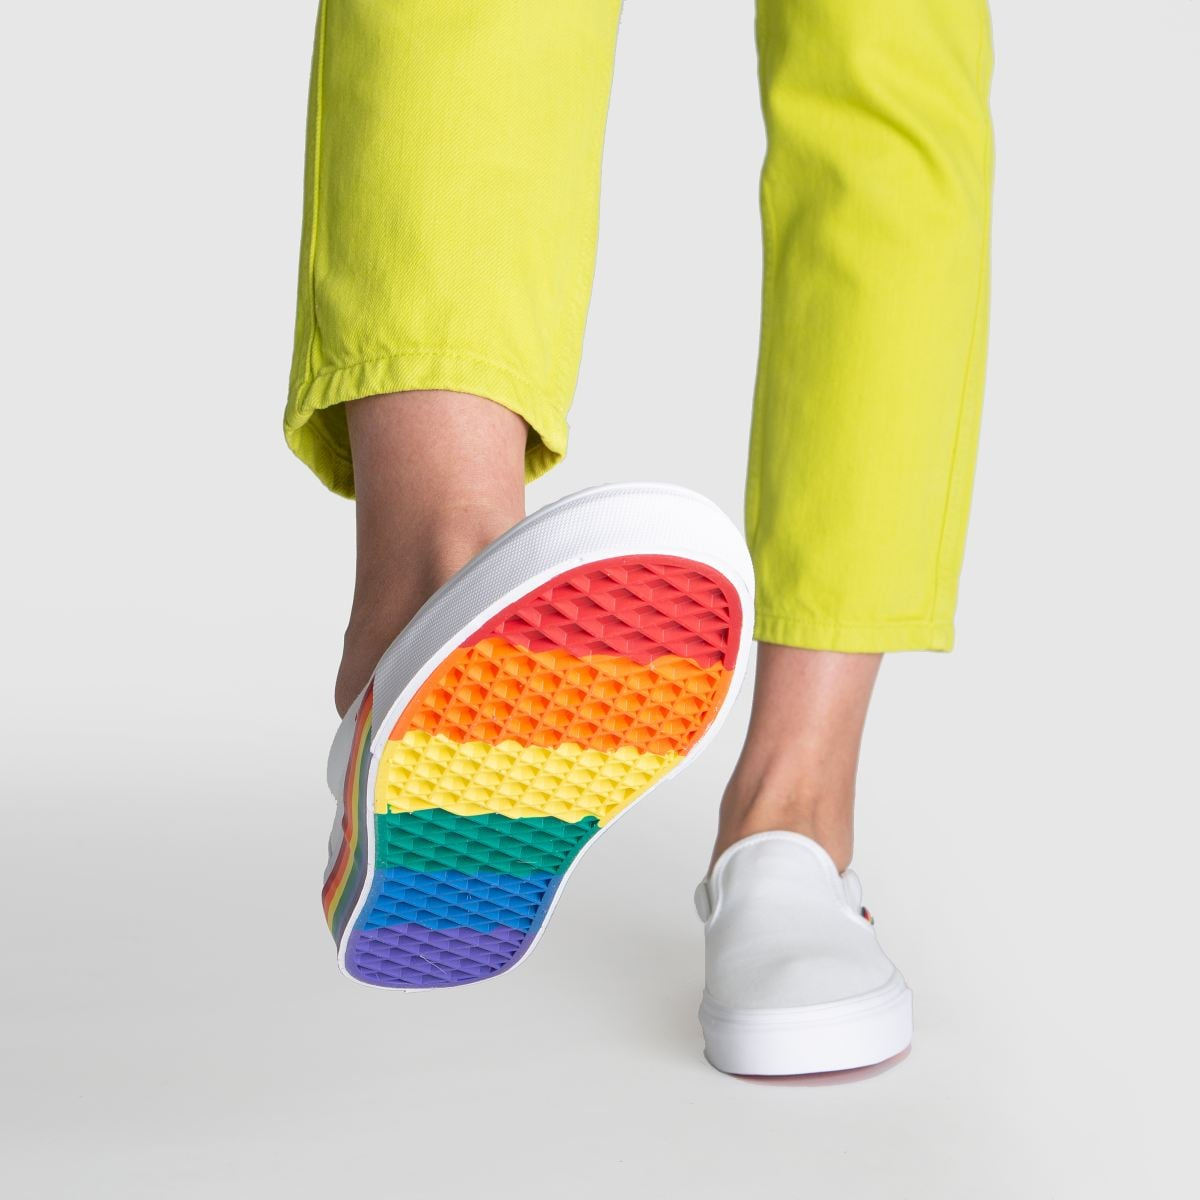 vans rainbow sole uk